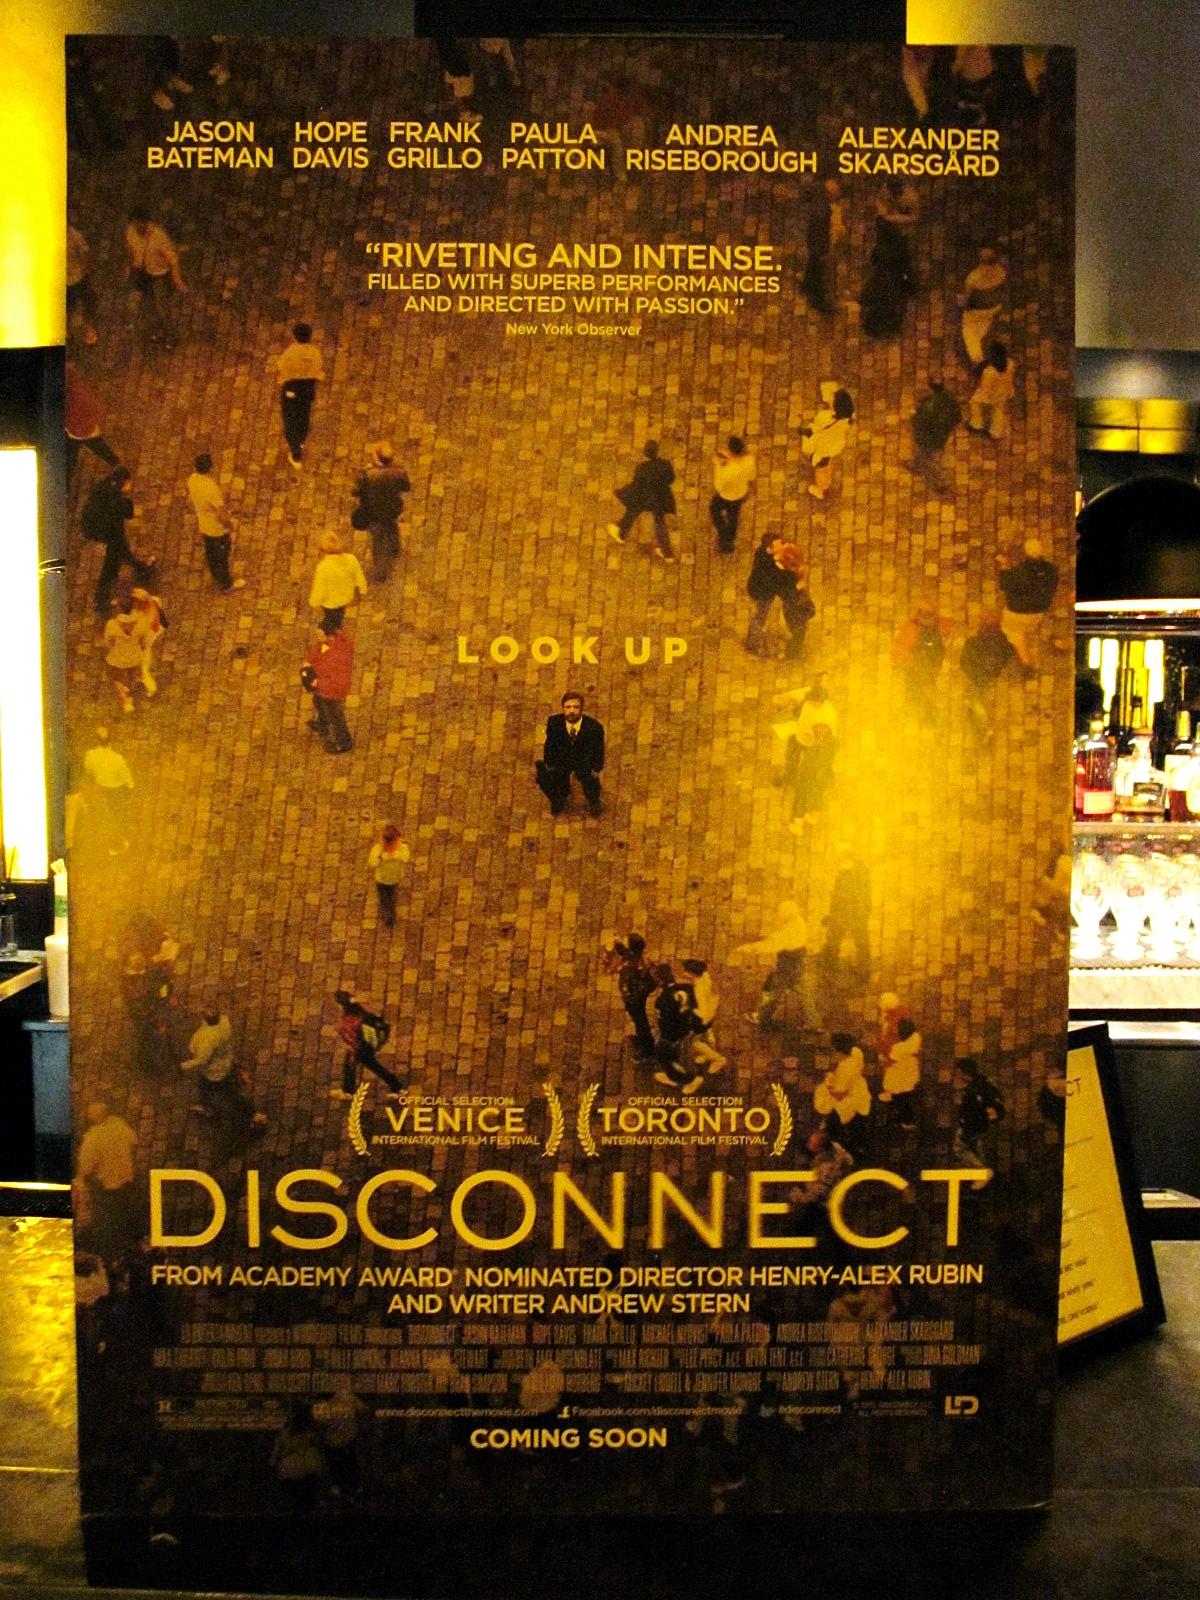 Disconnect movie premiere